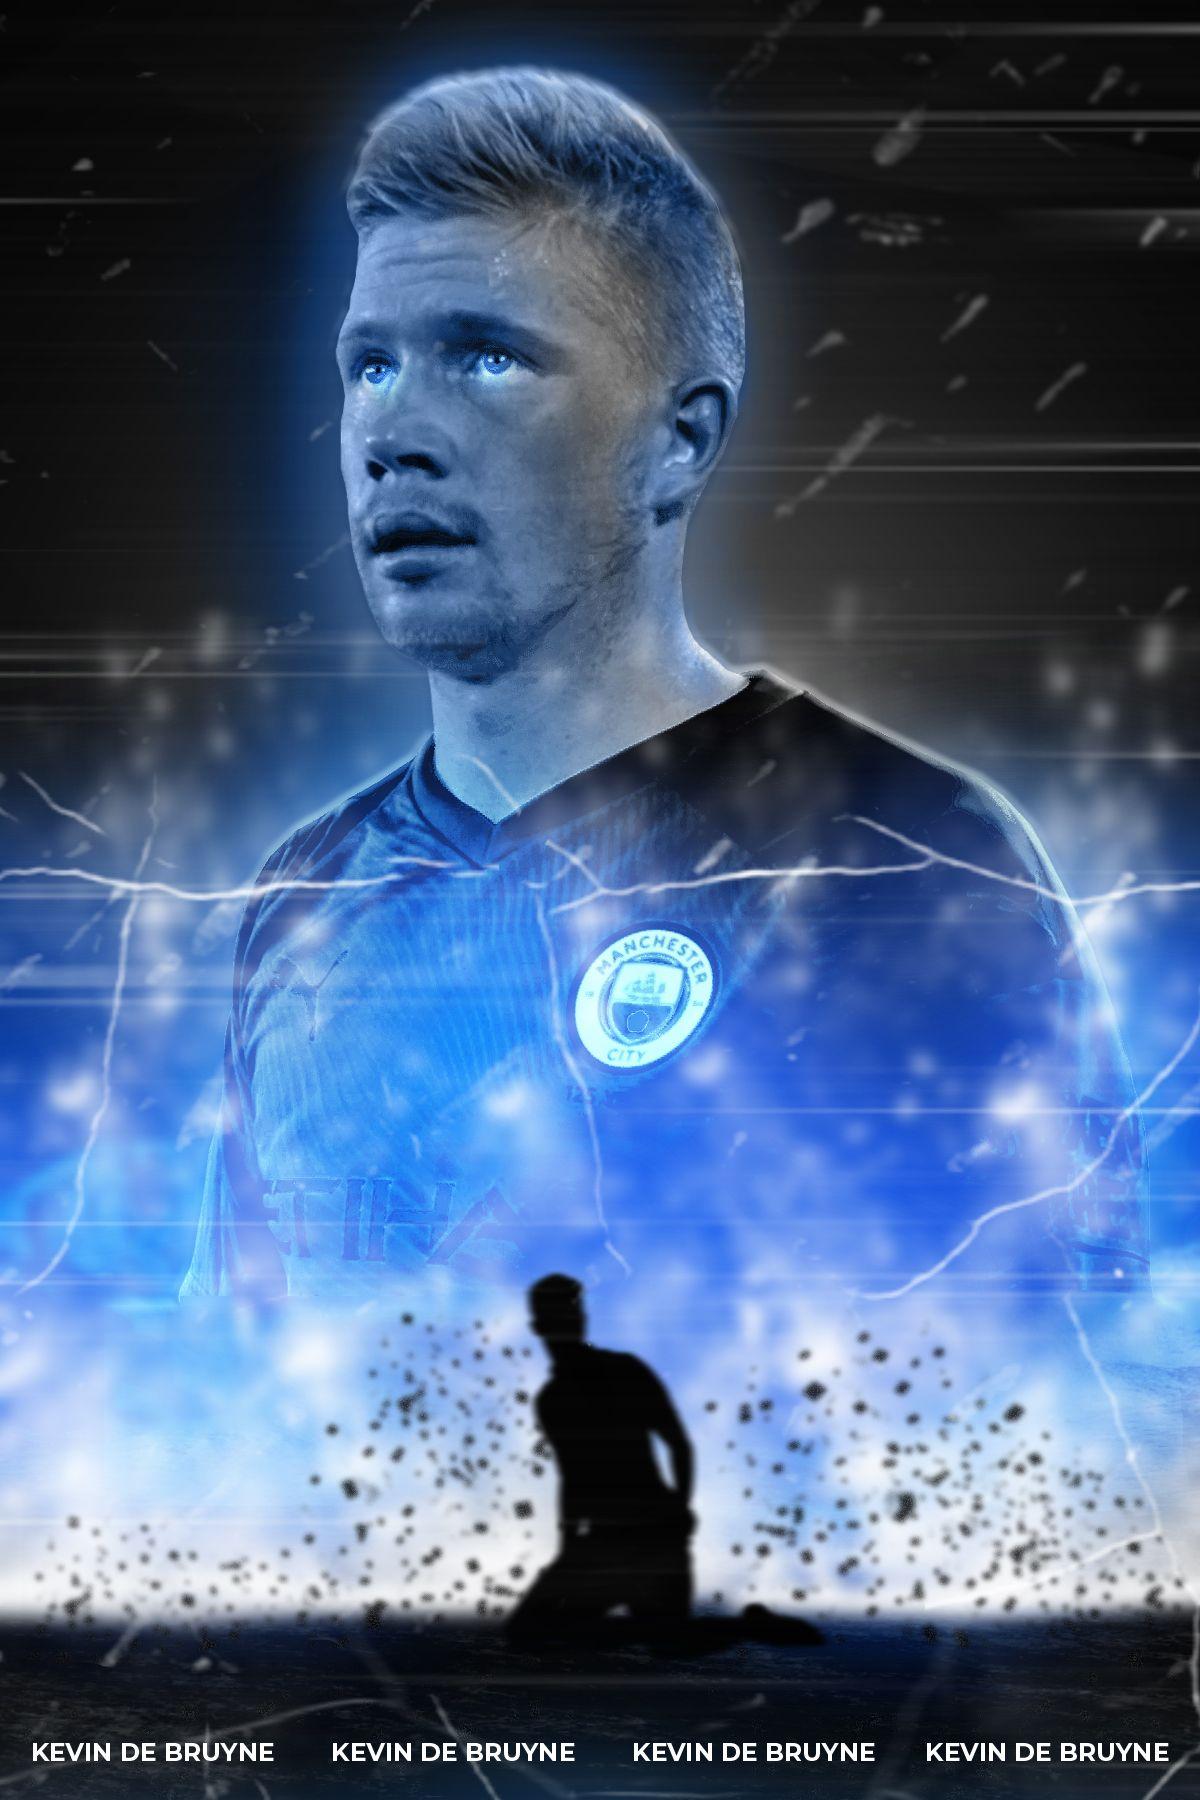 Digital art, photo manipulation, Premier League, football